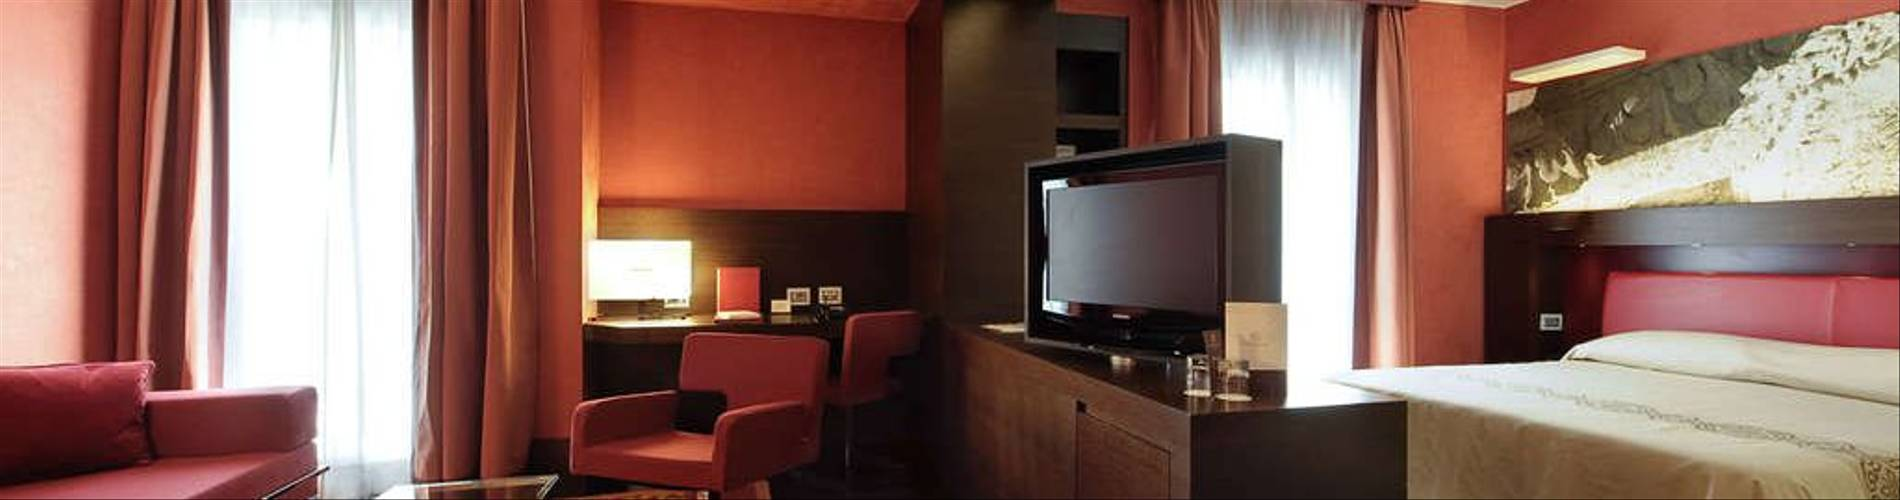 Risorgimento Resort 4.jpg